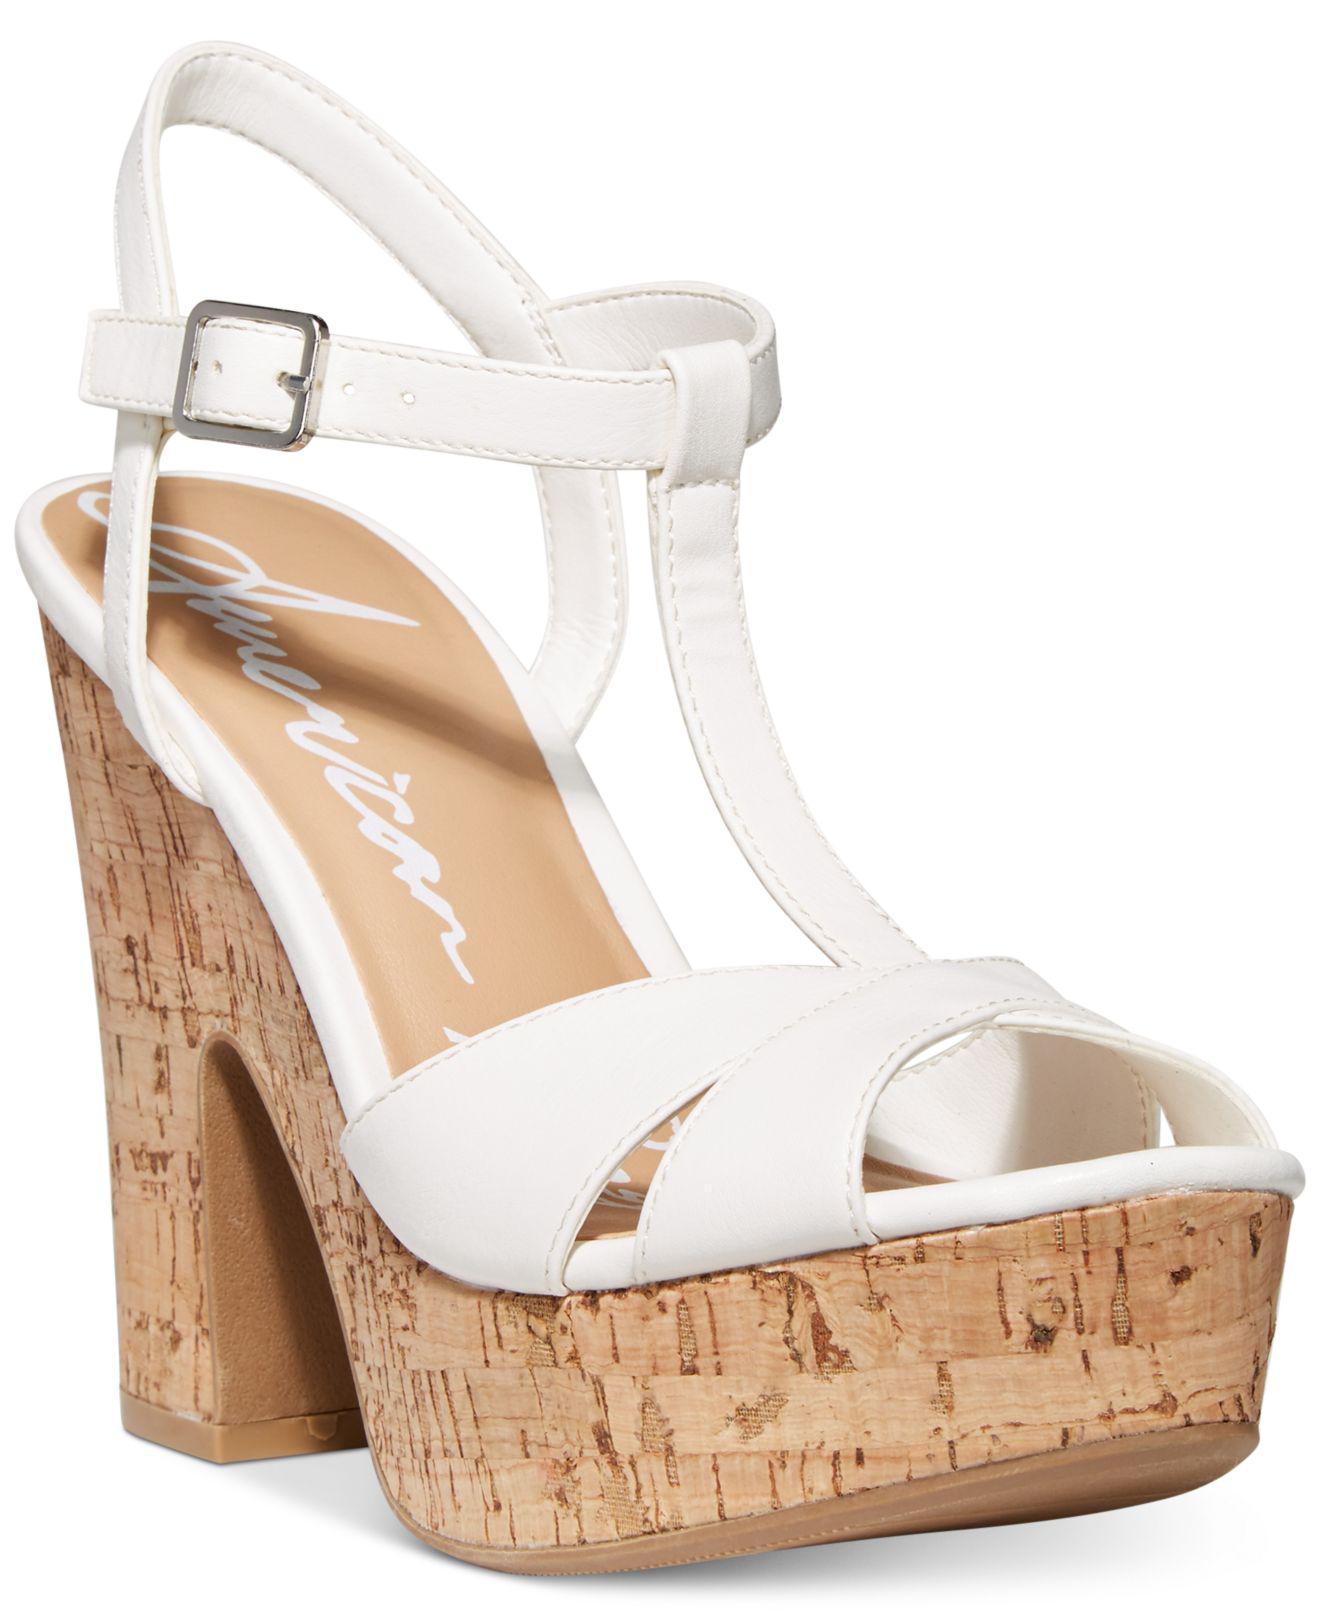 7a62f9ffed43 Lyst - American Rag Jamie T-strap Platform Dress Sandals